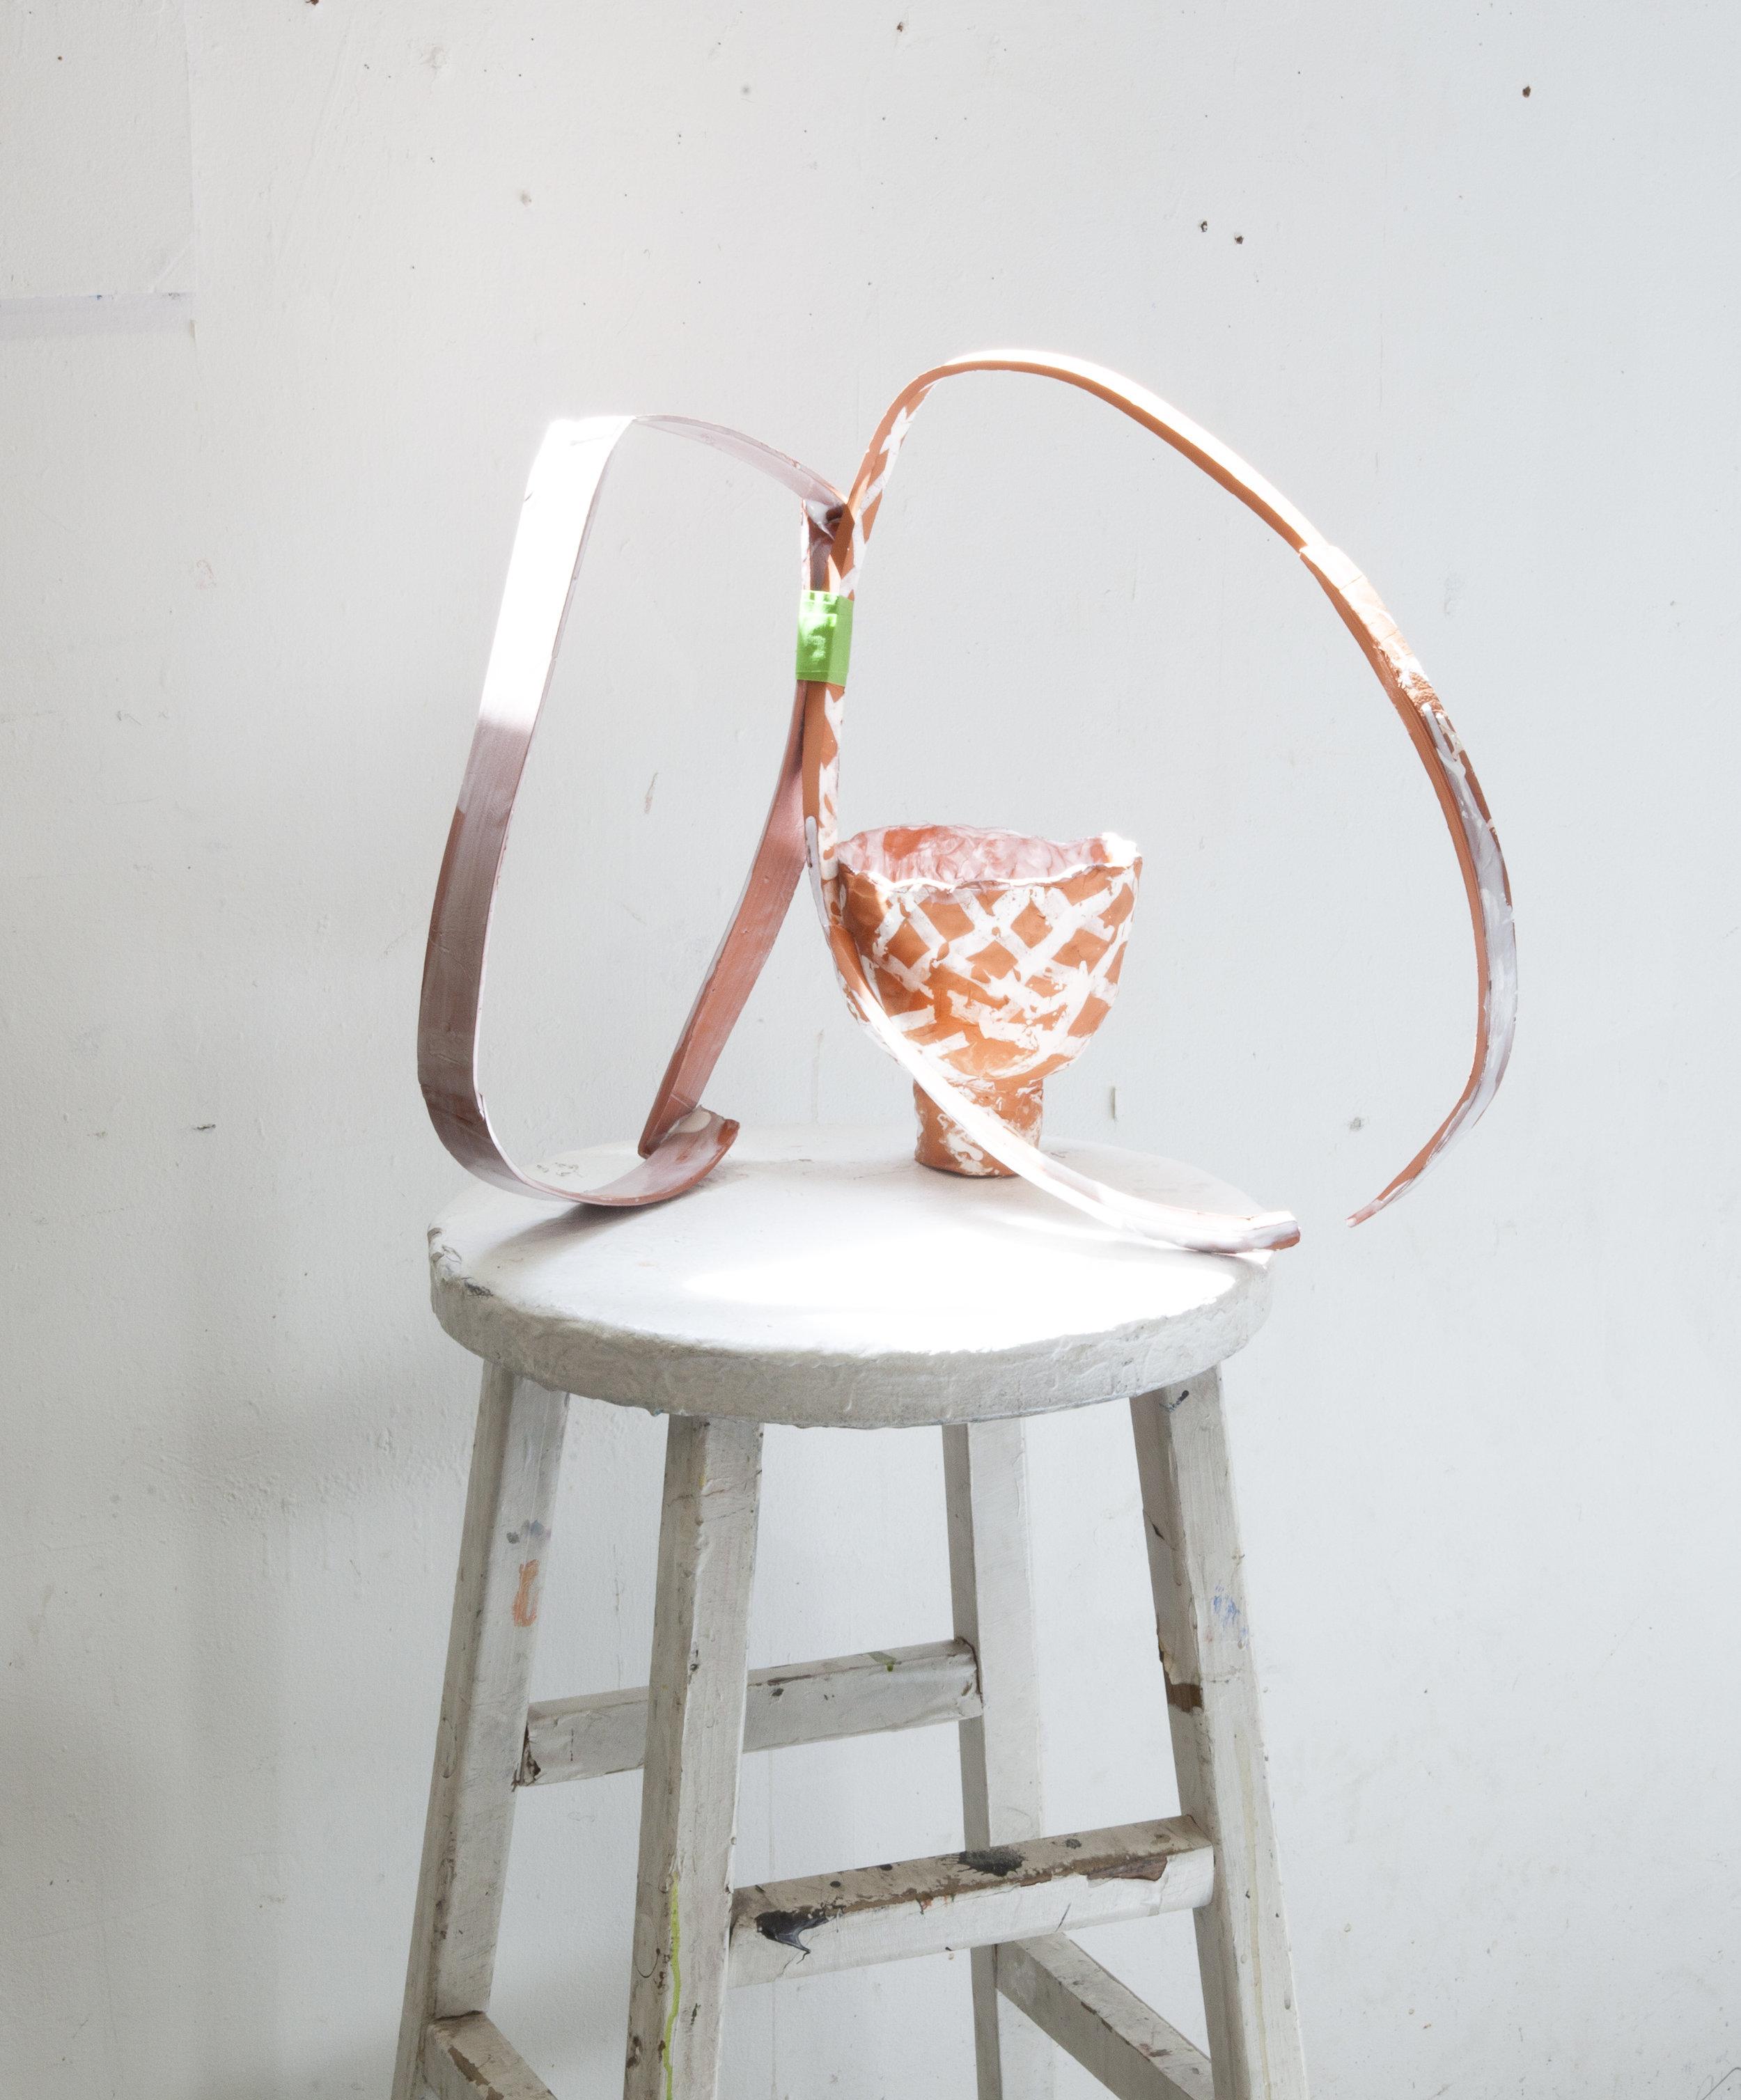 A False Desire  Ceramic, glaze, masking tape, stool 15h x 17l x 9w in 2018